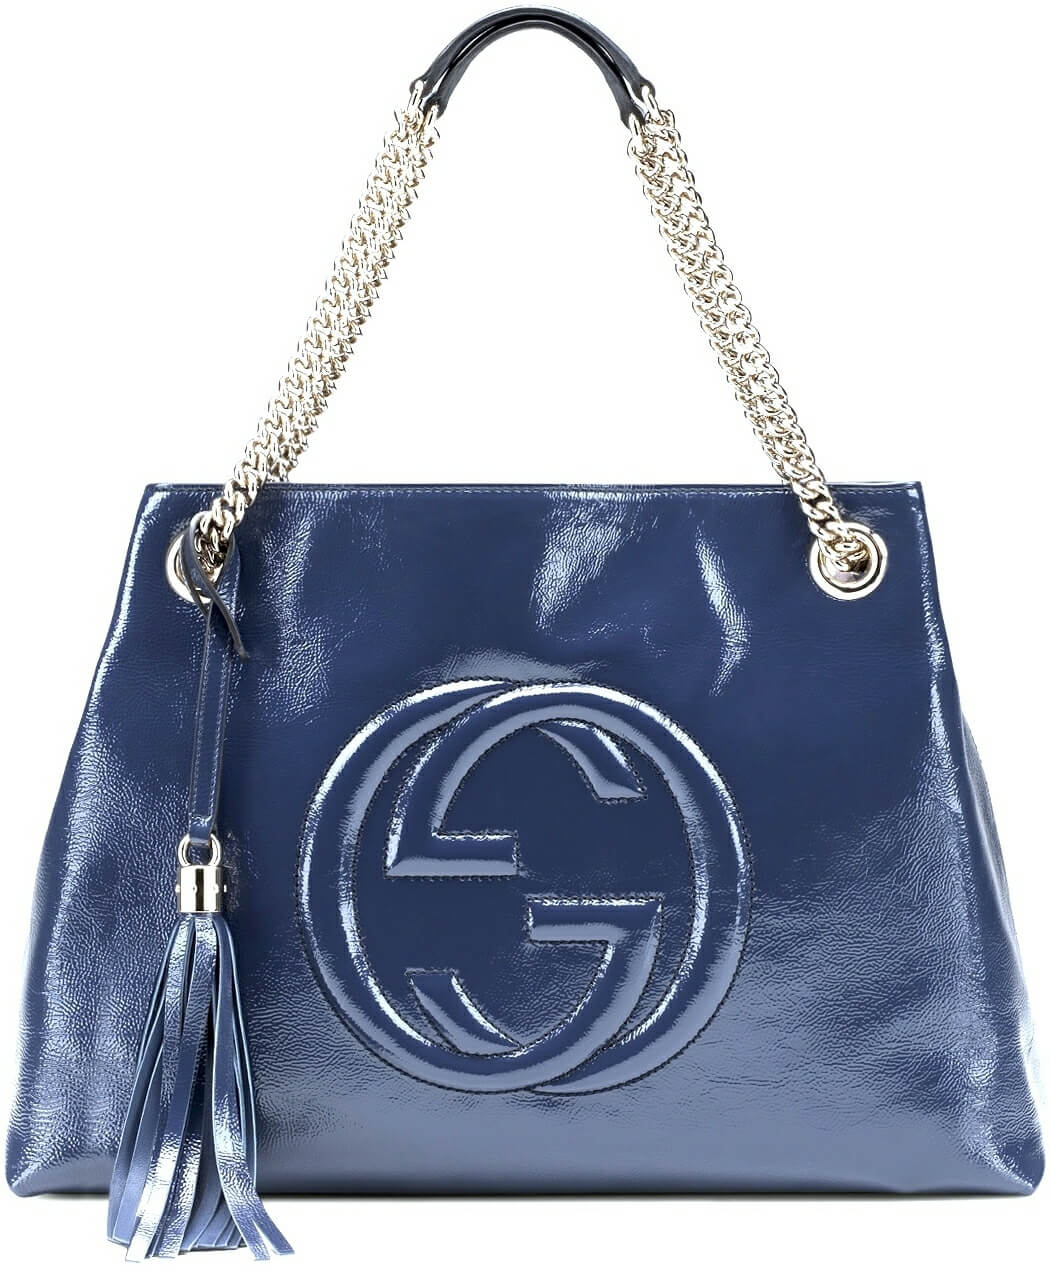 Wishlist di Natale: Gucci Soho Bag in pelle e vernice blu notte